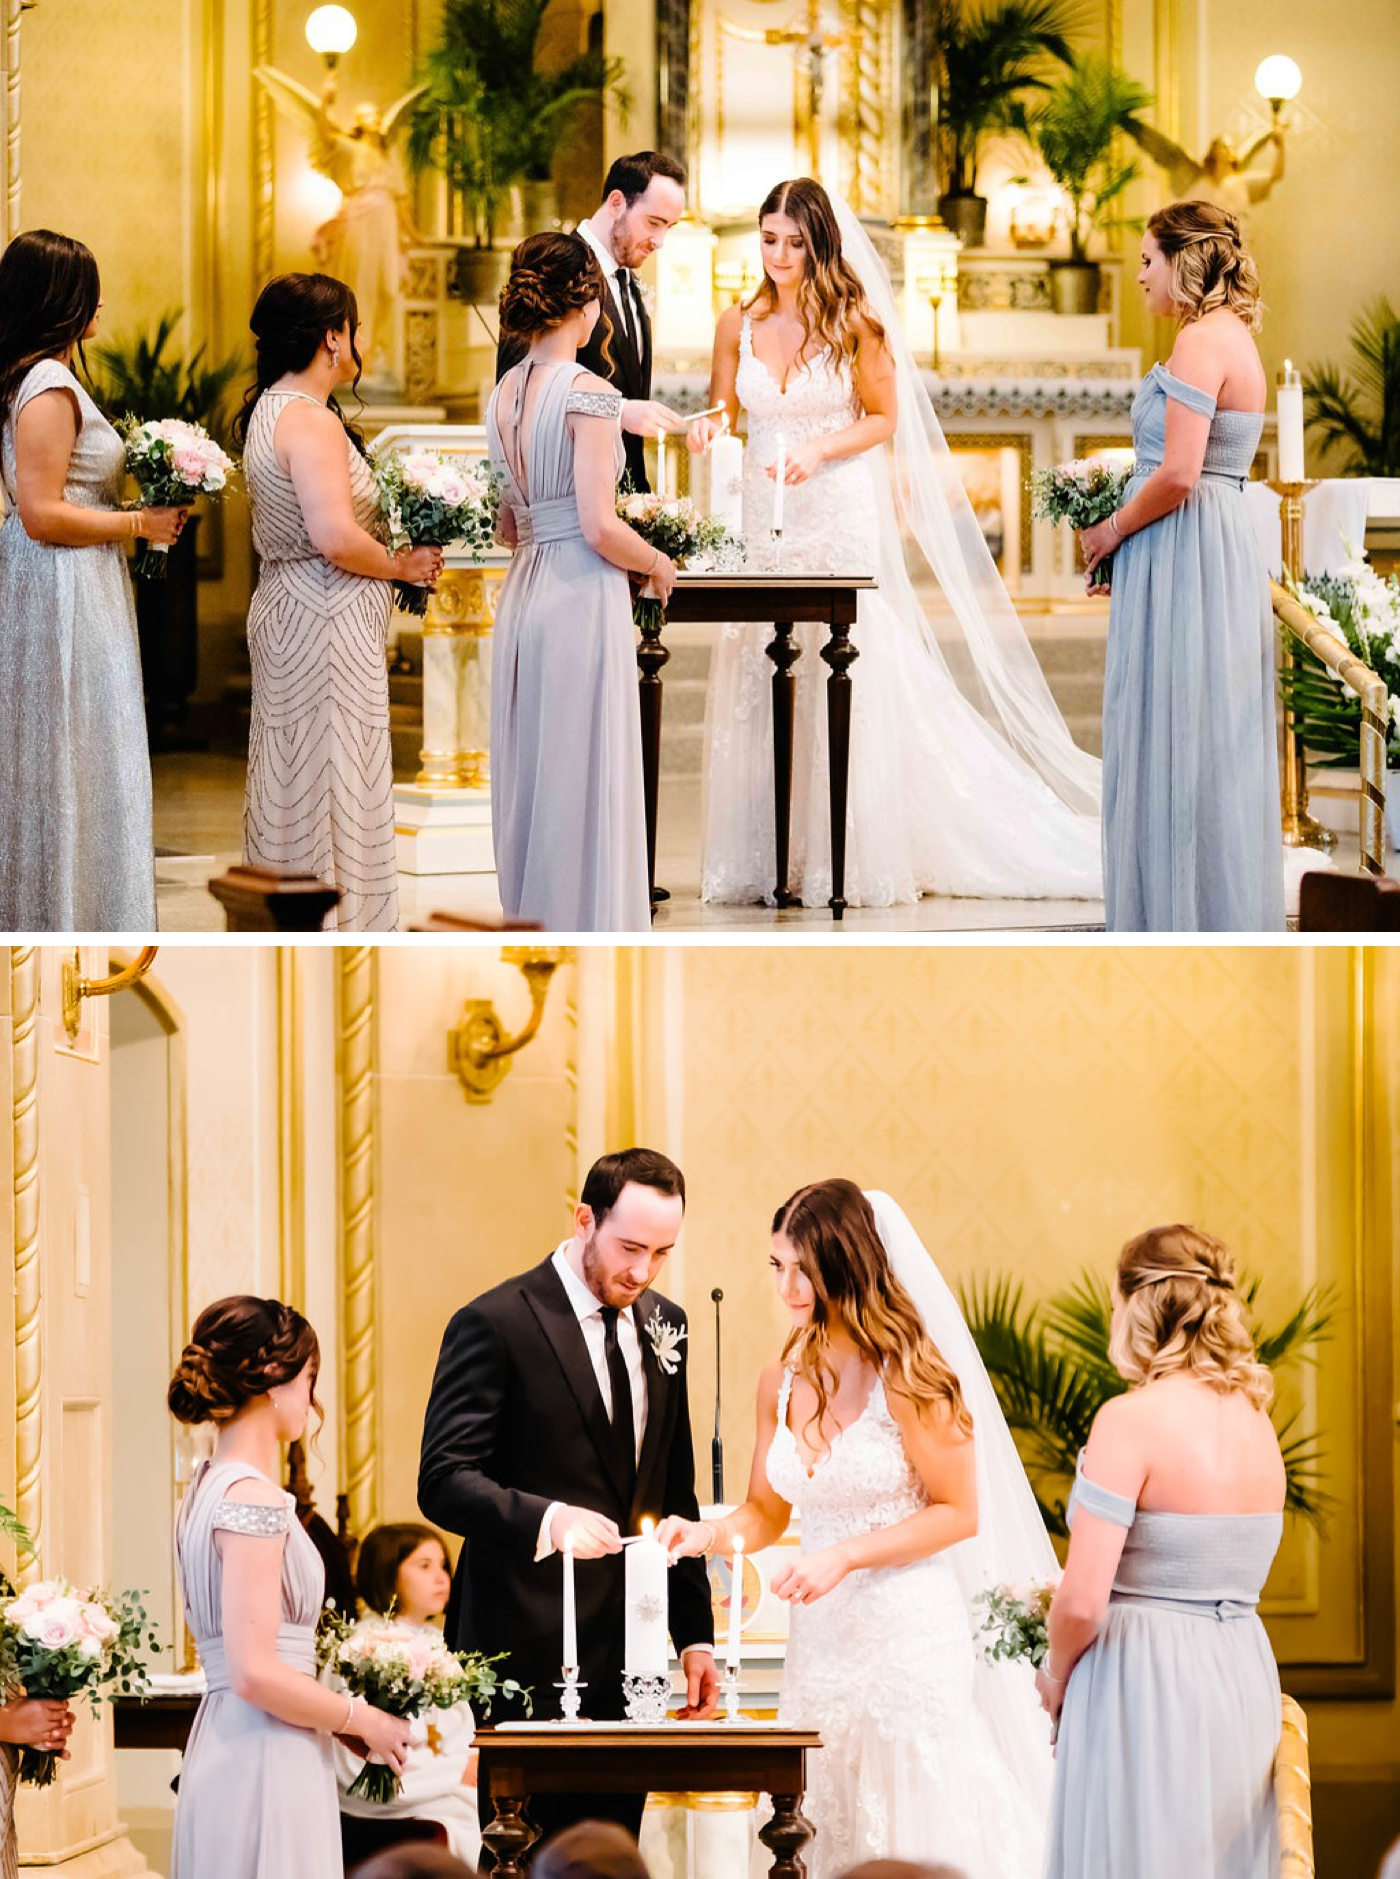 chicago-fine-art-wedding-photography-duncan42